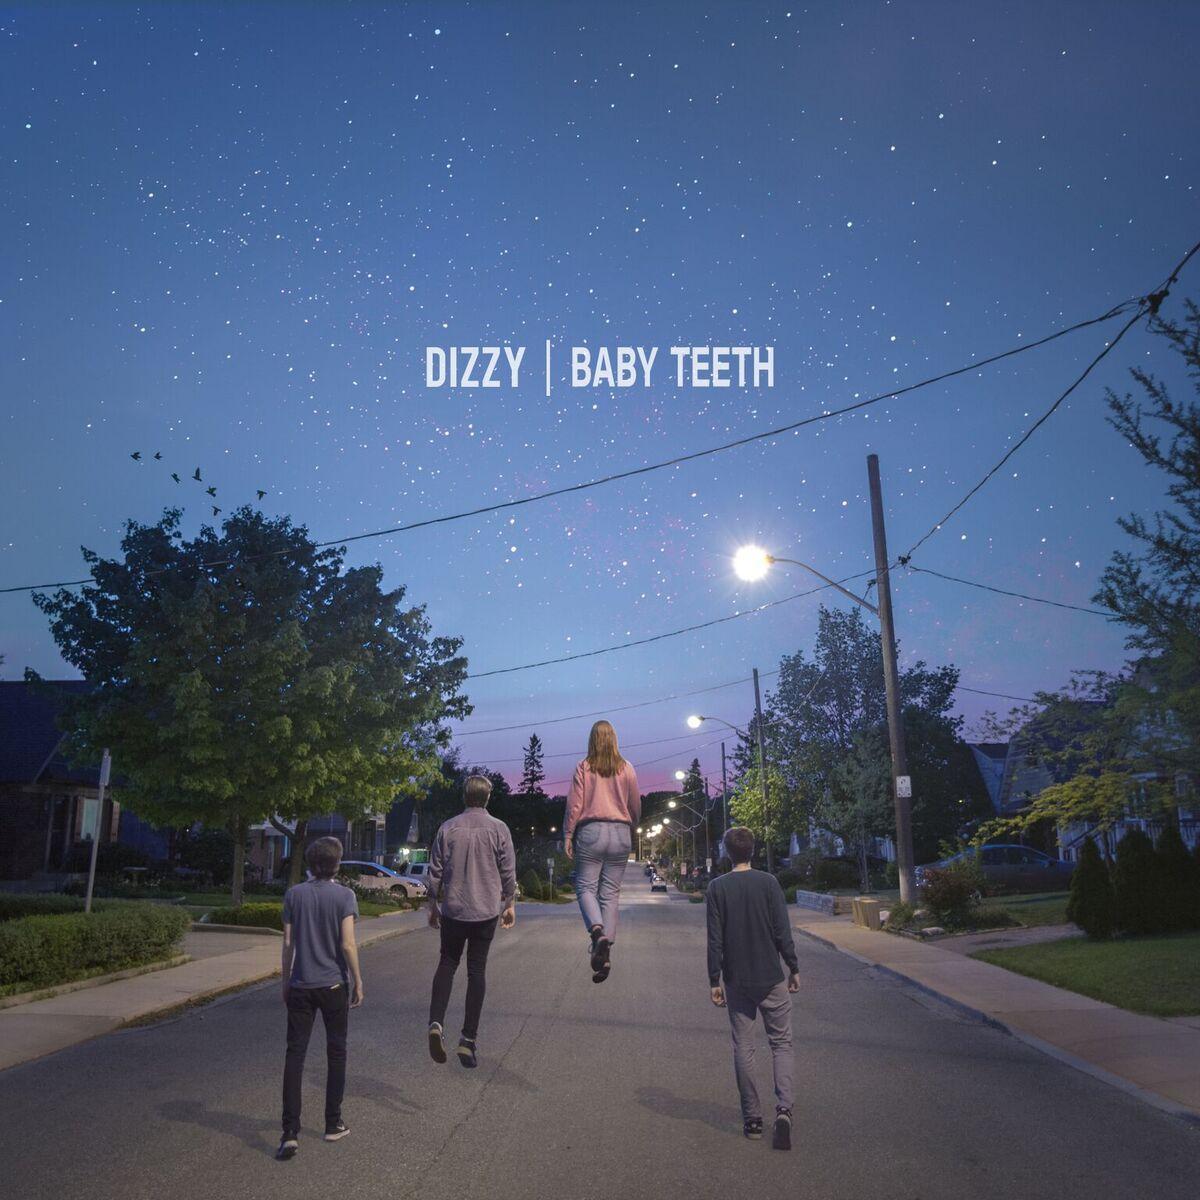 Dizzy - Baby Teeth